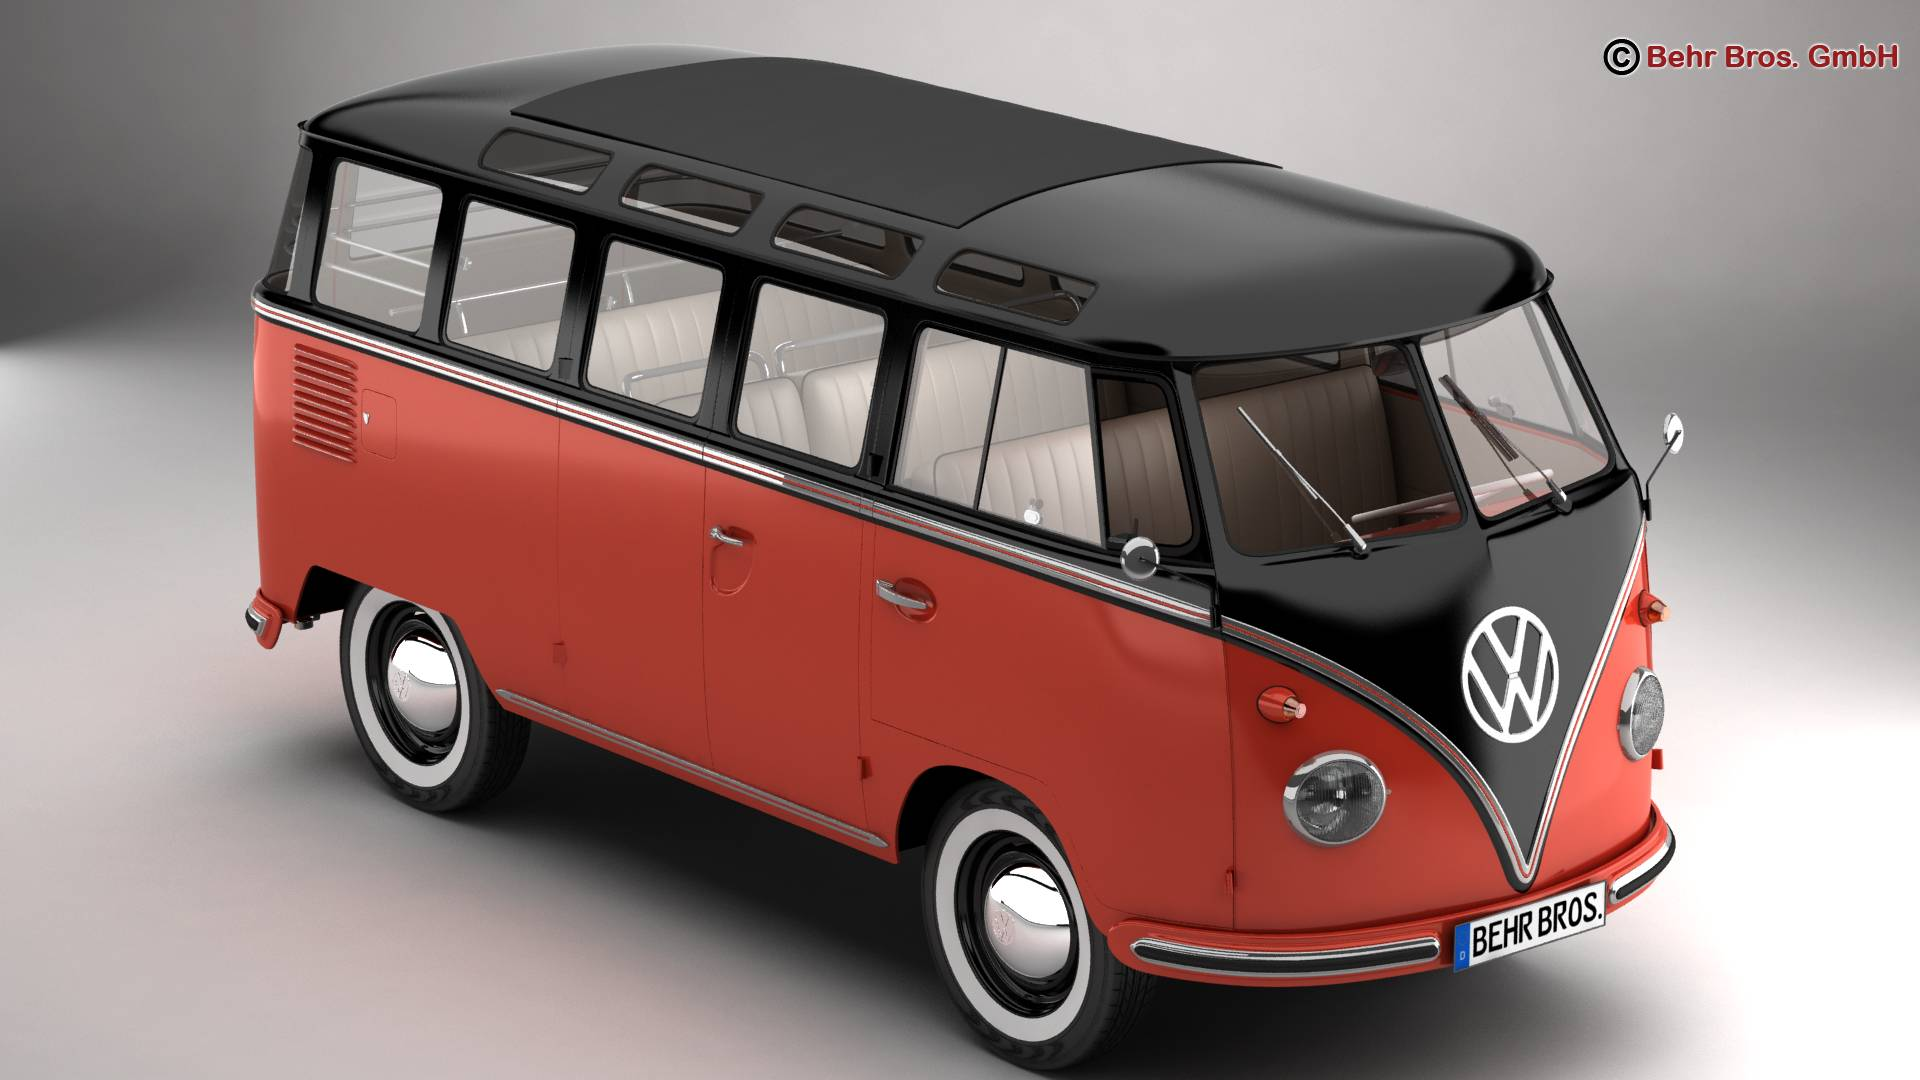 volkswagen type 2 samba 1959 3d model 3ds max fbx c4d lwo ma mb obj 217105